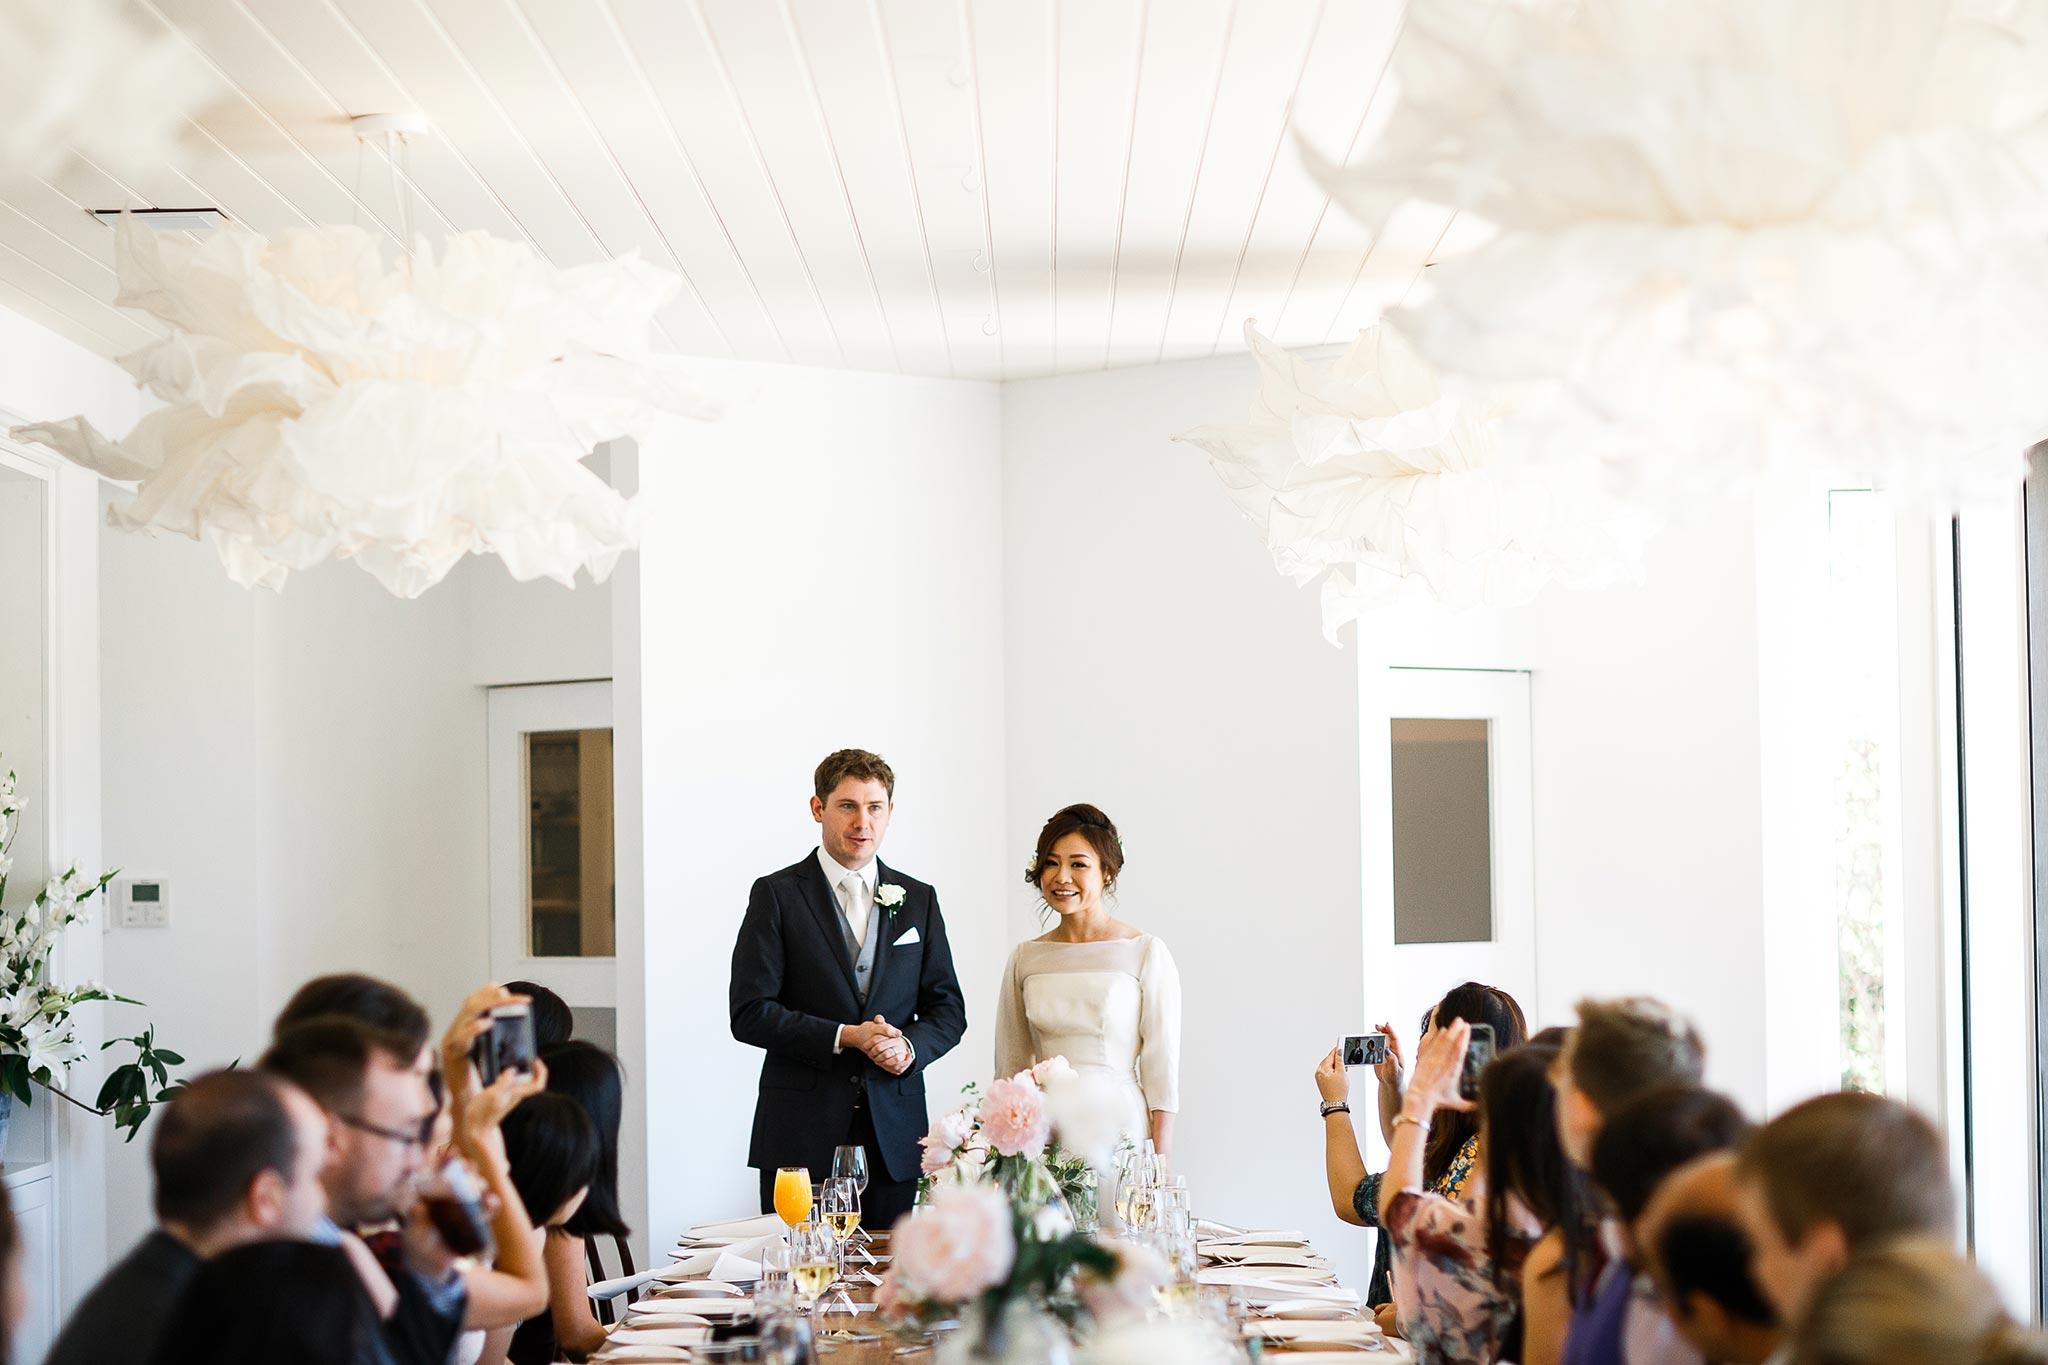 Daylesford-Lake-House-Wedding-Photography-lunch-reception-speech